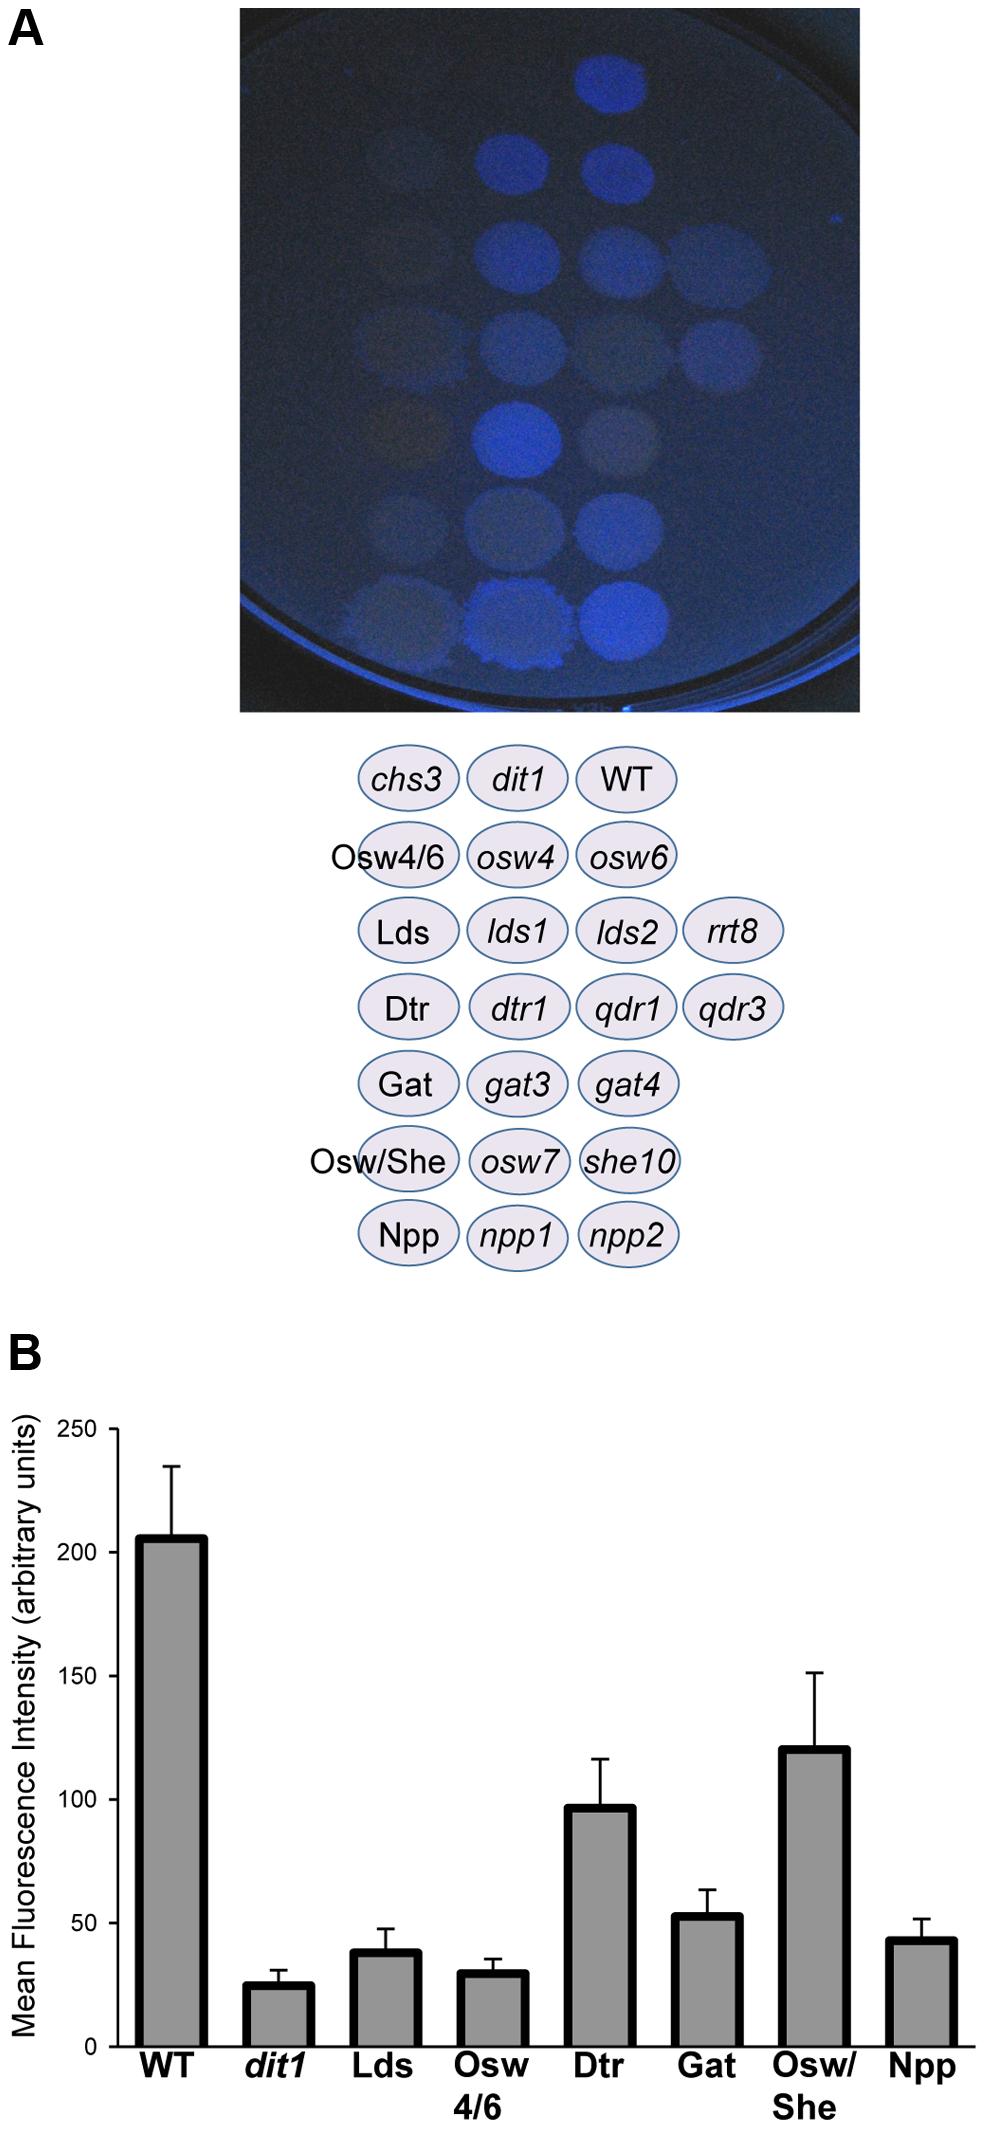 The effect of deletion of paralog sets on dityrosine fluorescence.